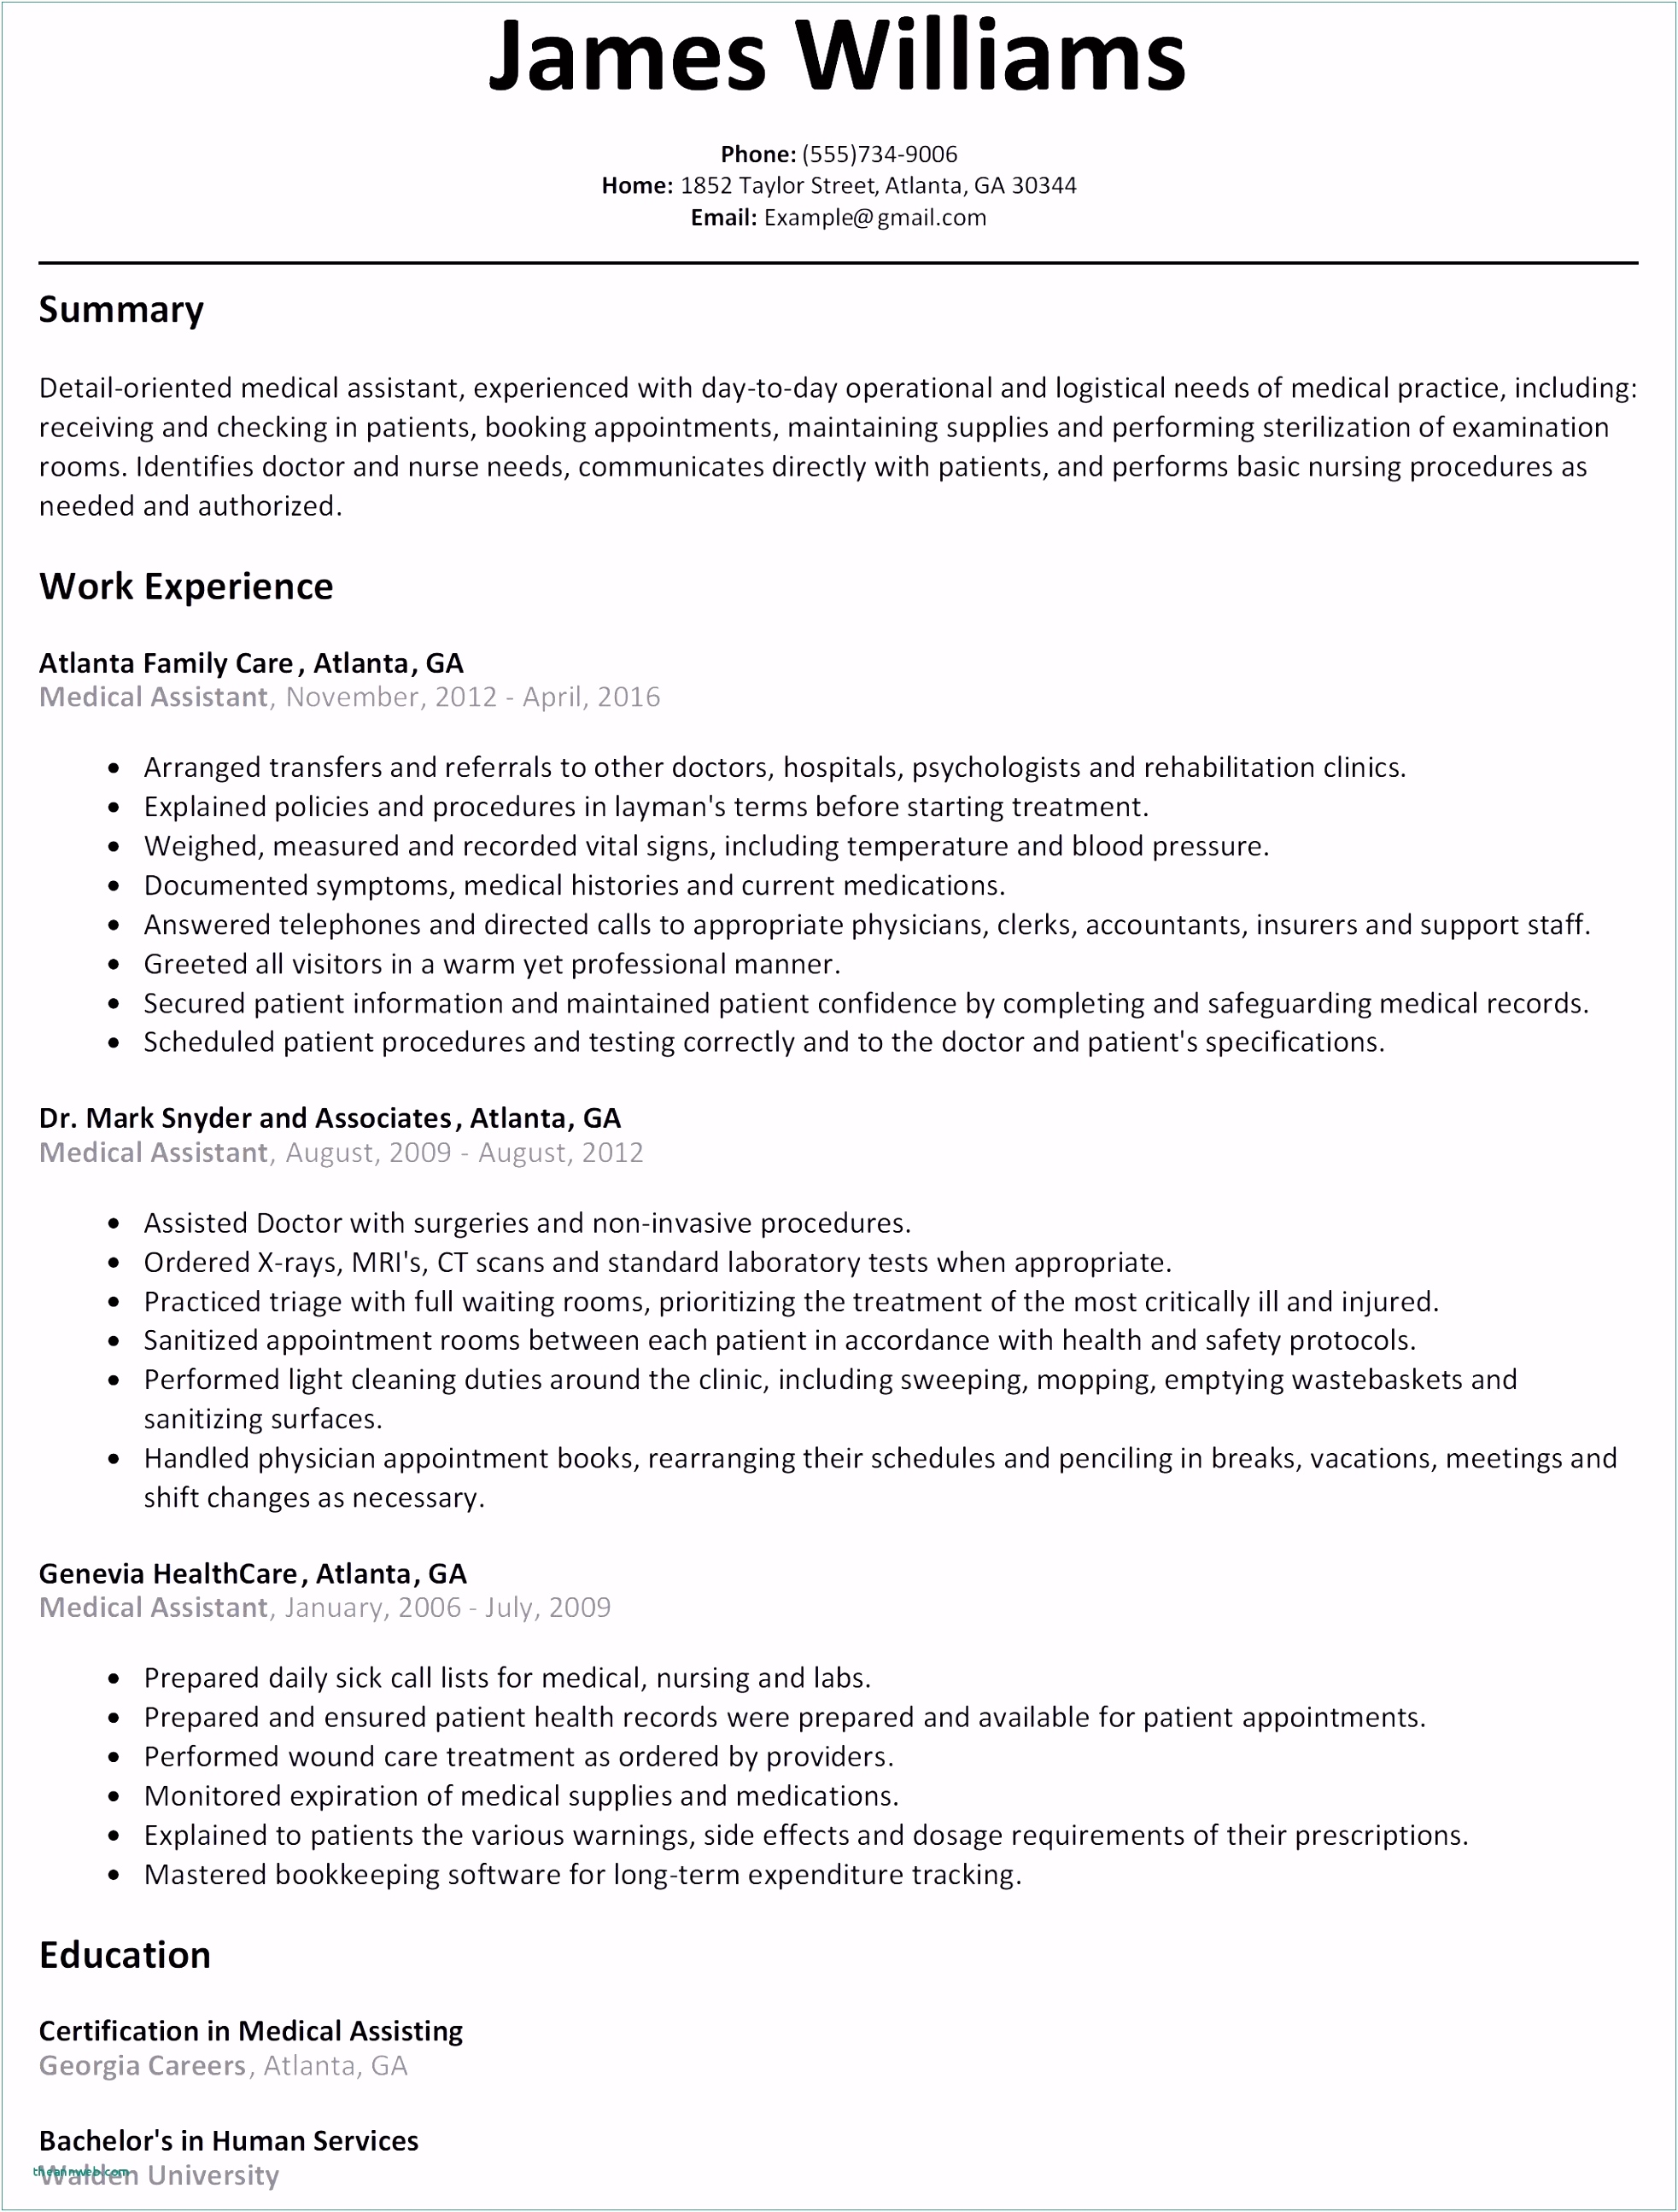 Resume Styles 2017 1 Page Resume Template Word Valid Best Finance Cv